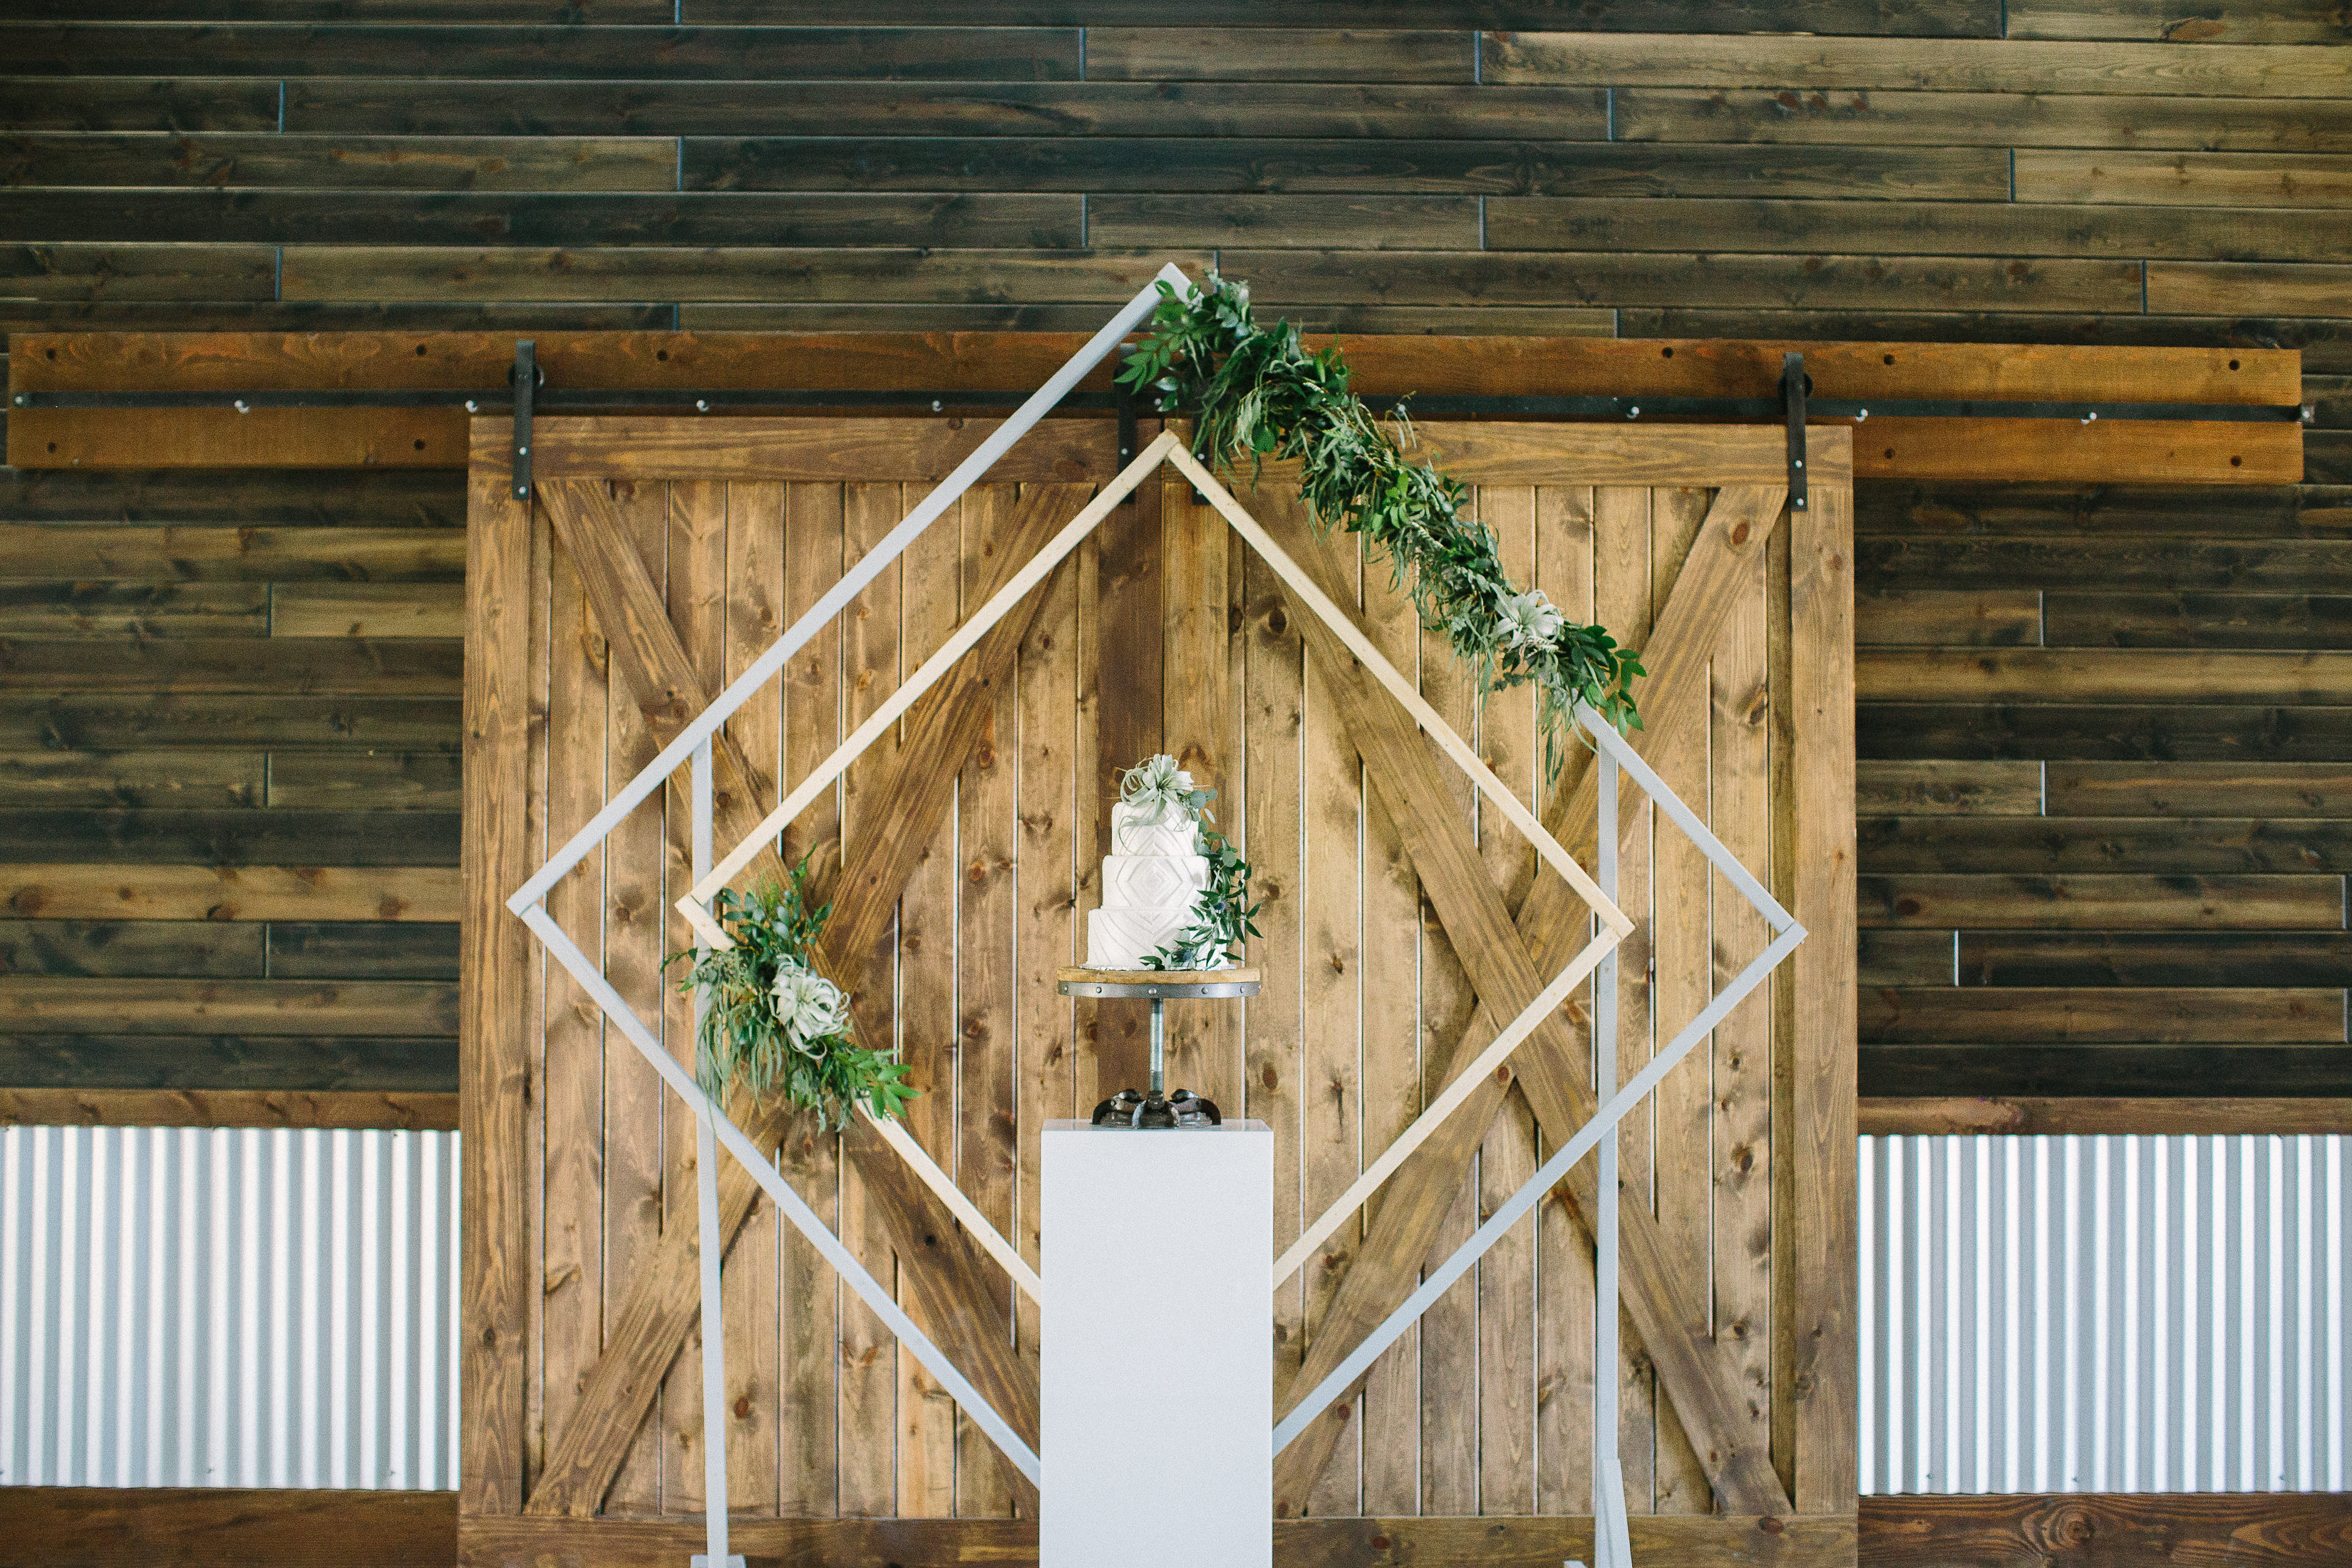 Ellen-Ashton-Photography-Peach-Creek-Ranch-Weddings-Wed-and-Prosper120